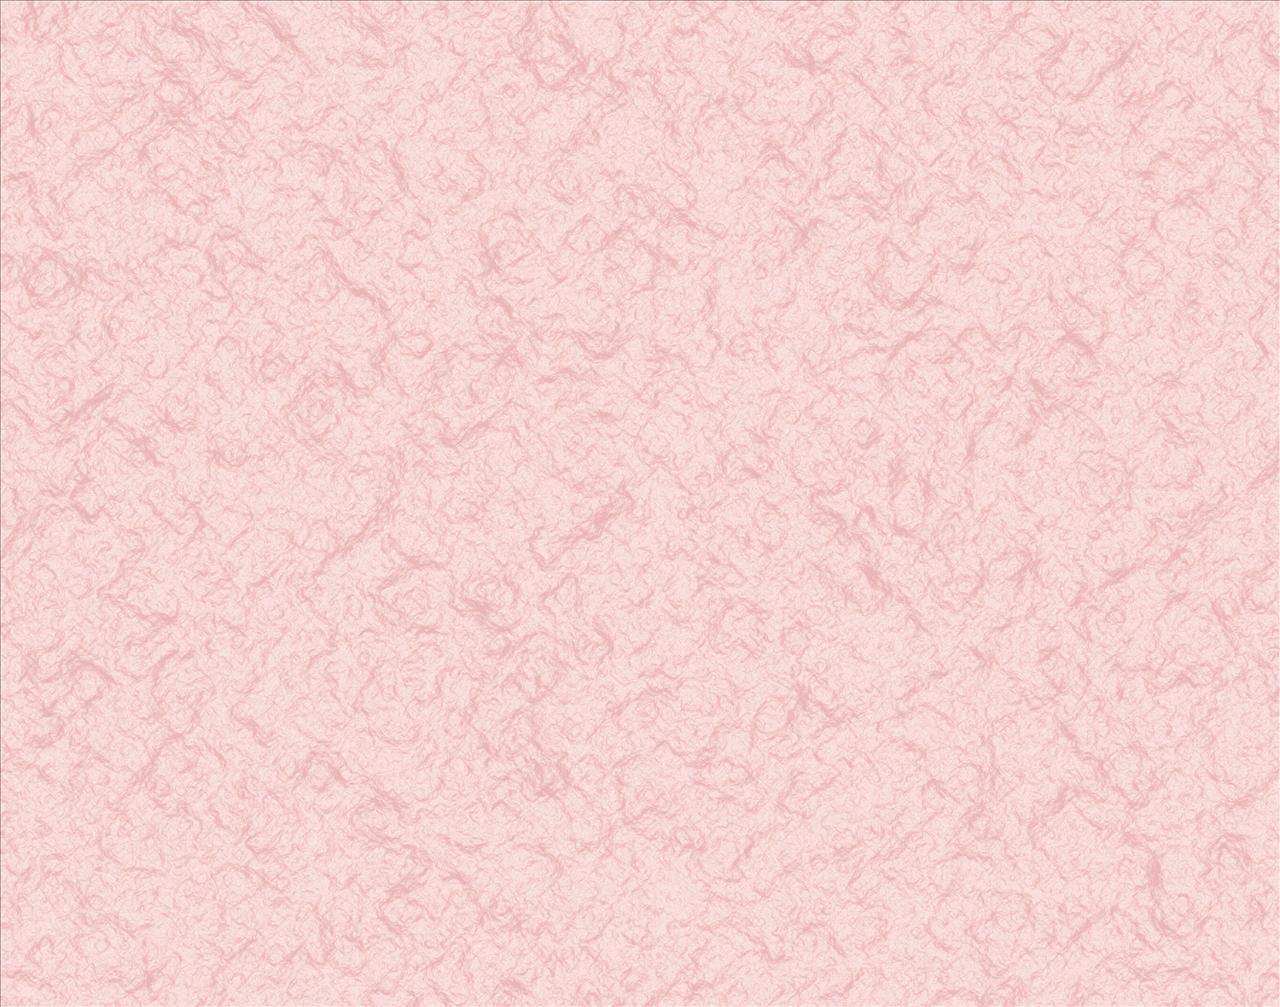 soft pink background tumblr - photo #16